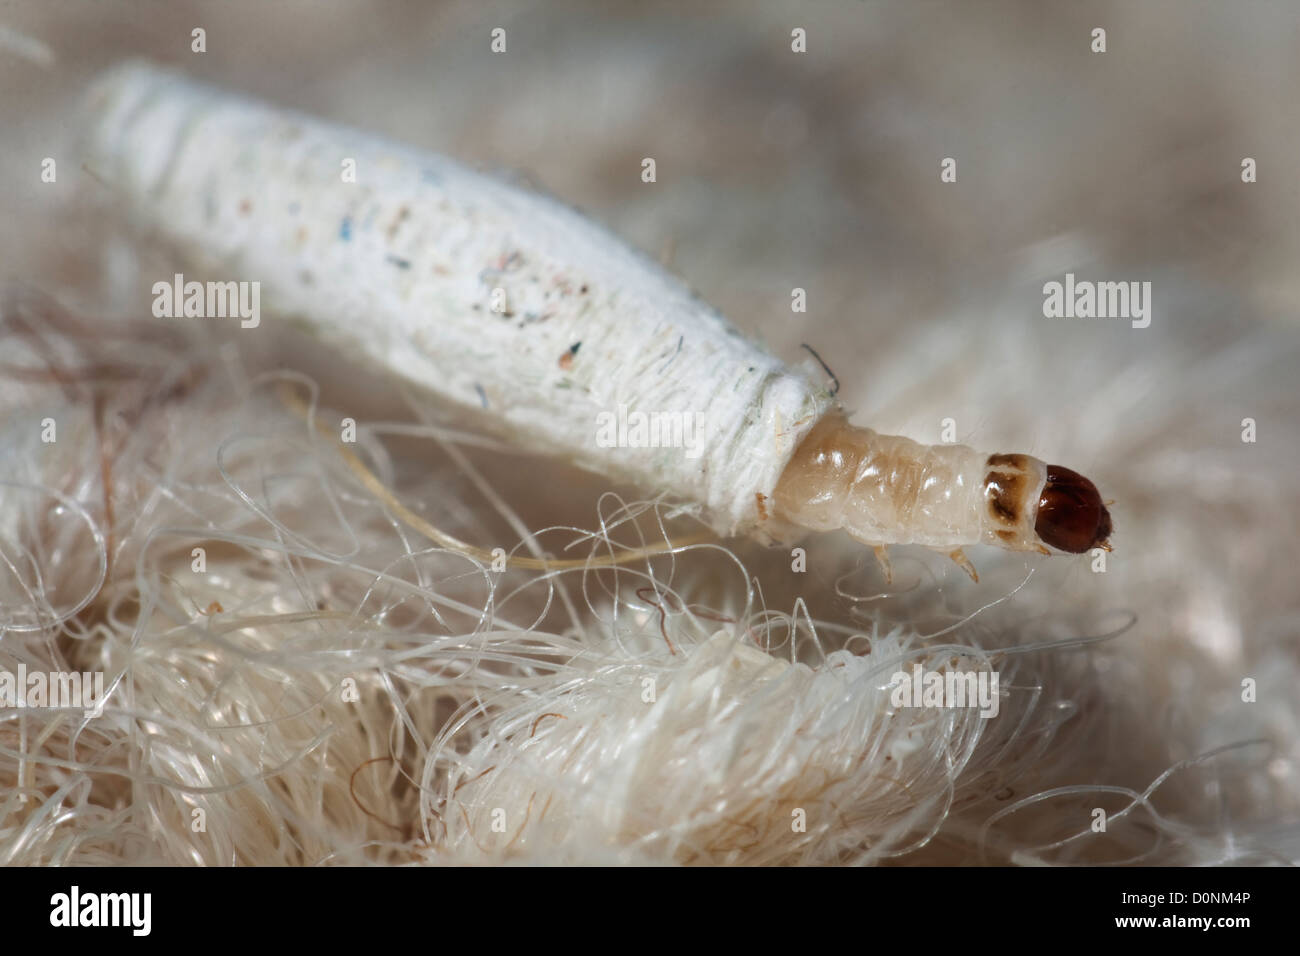 Carpet Or Common Clothes Moth Larvae Tineola Bisselliella